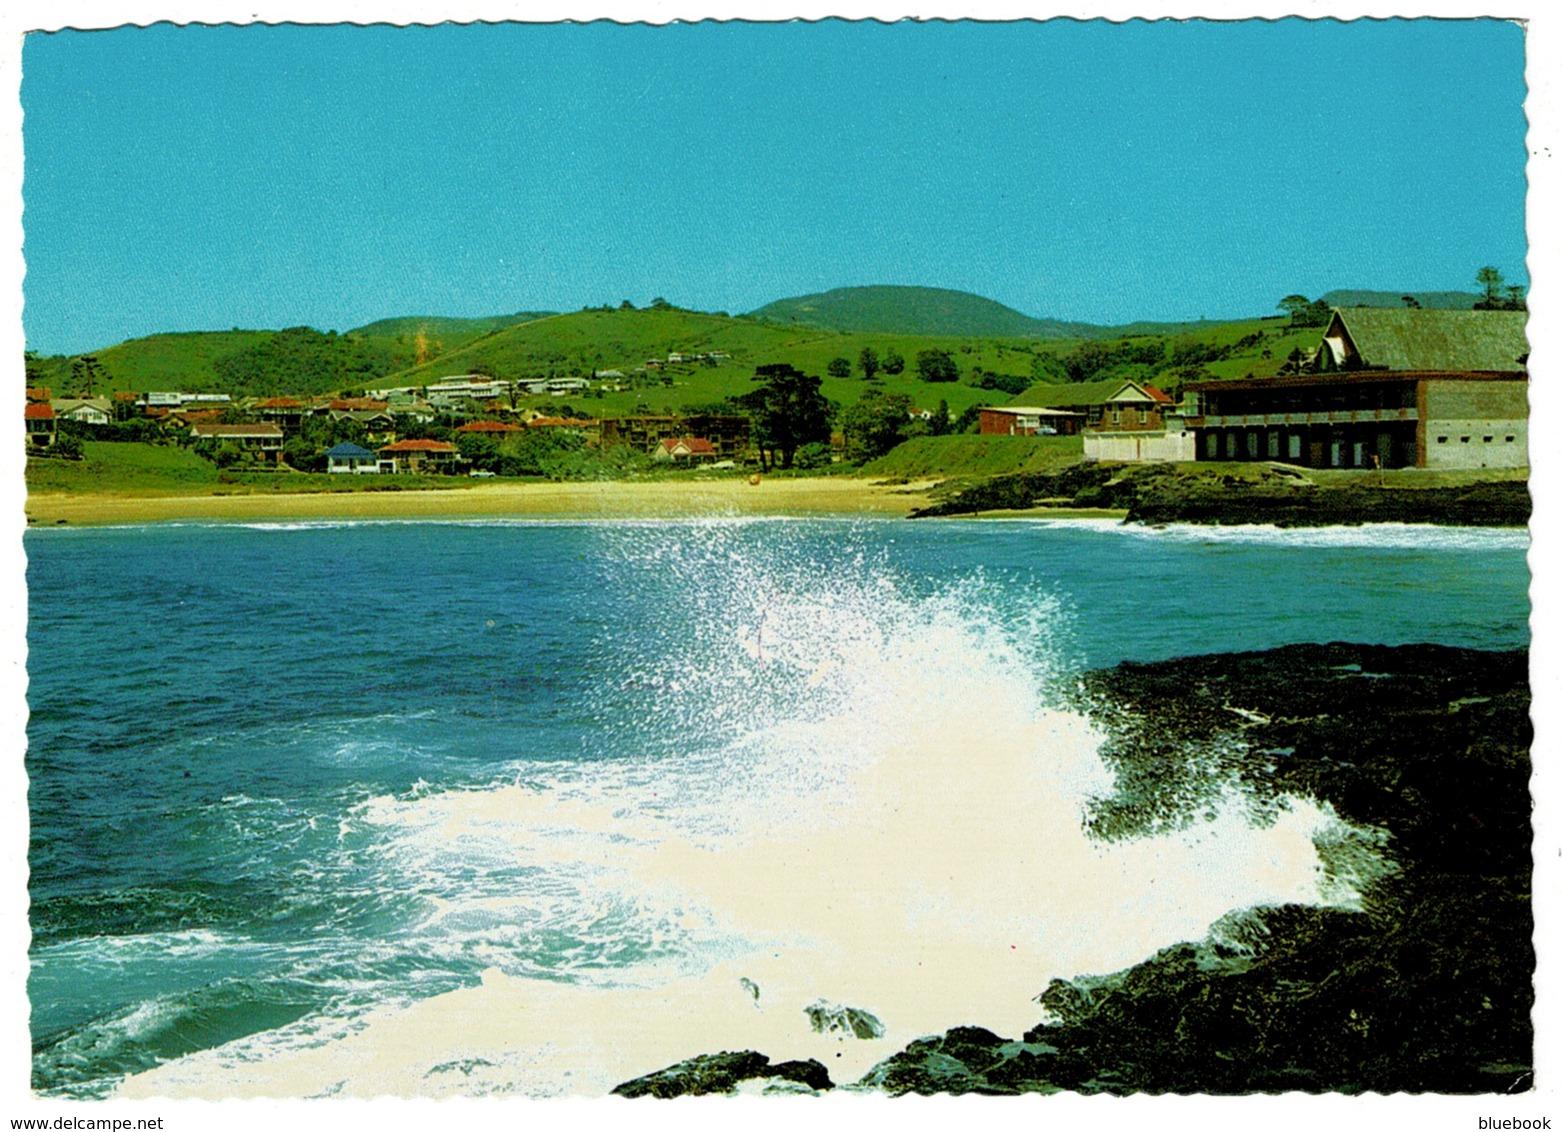 Ref 1260 - Postcard - Surfing Beach & Club House Kiama - New South Wales - Australia - Australie